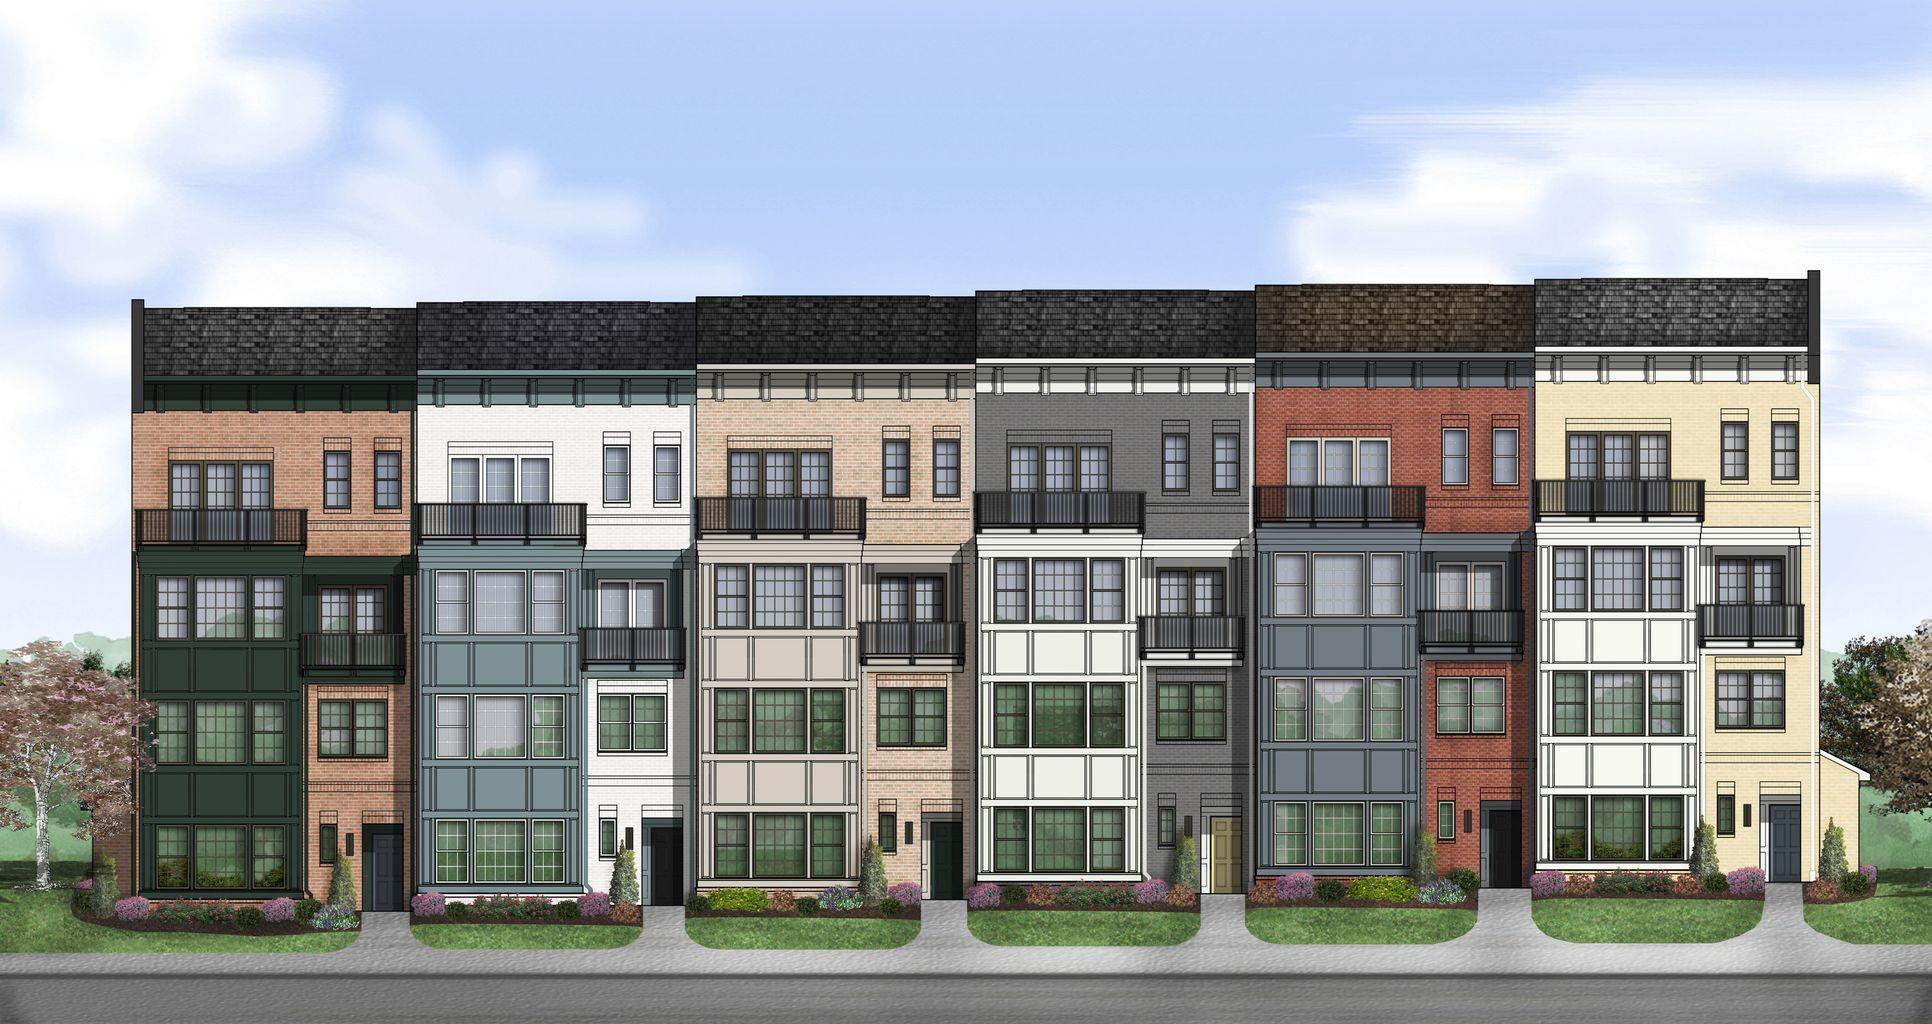 Condominium Elevation:Condominium Elevation